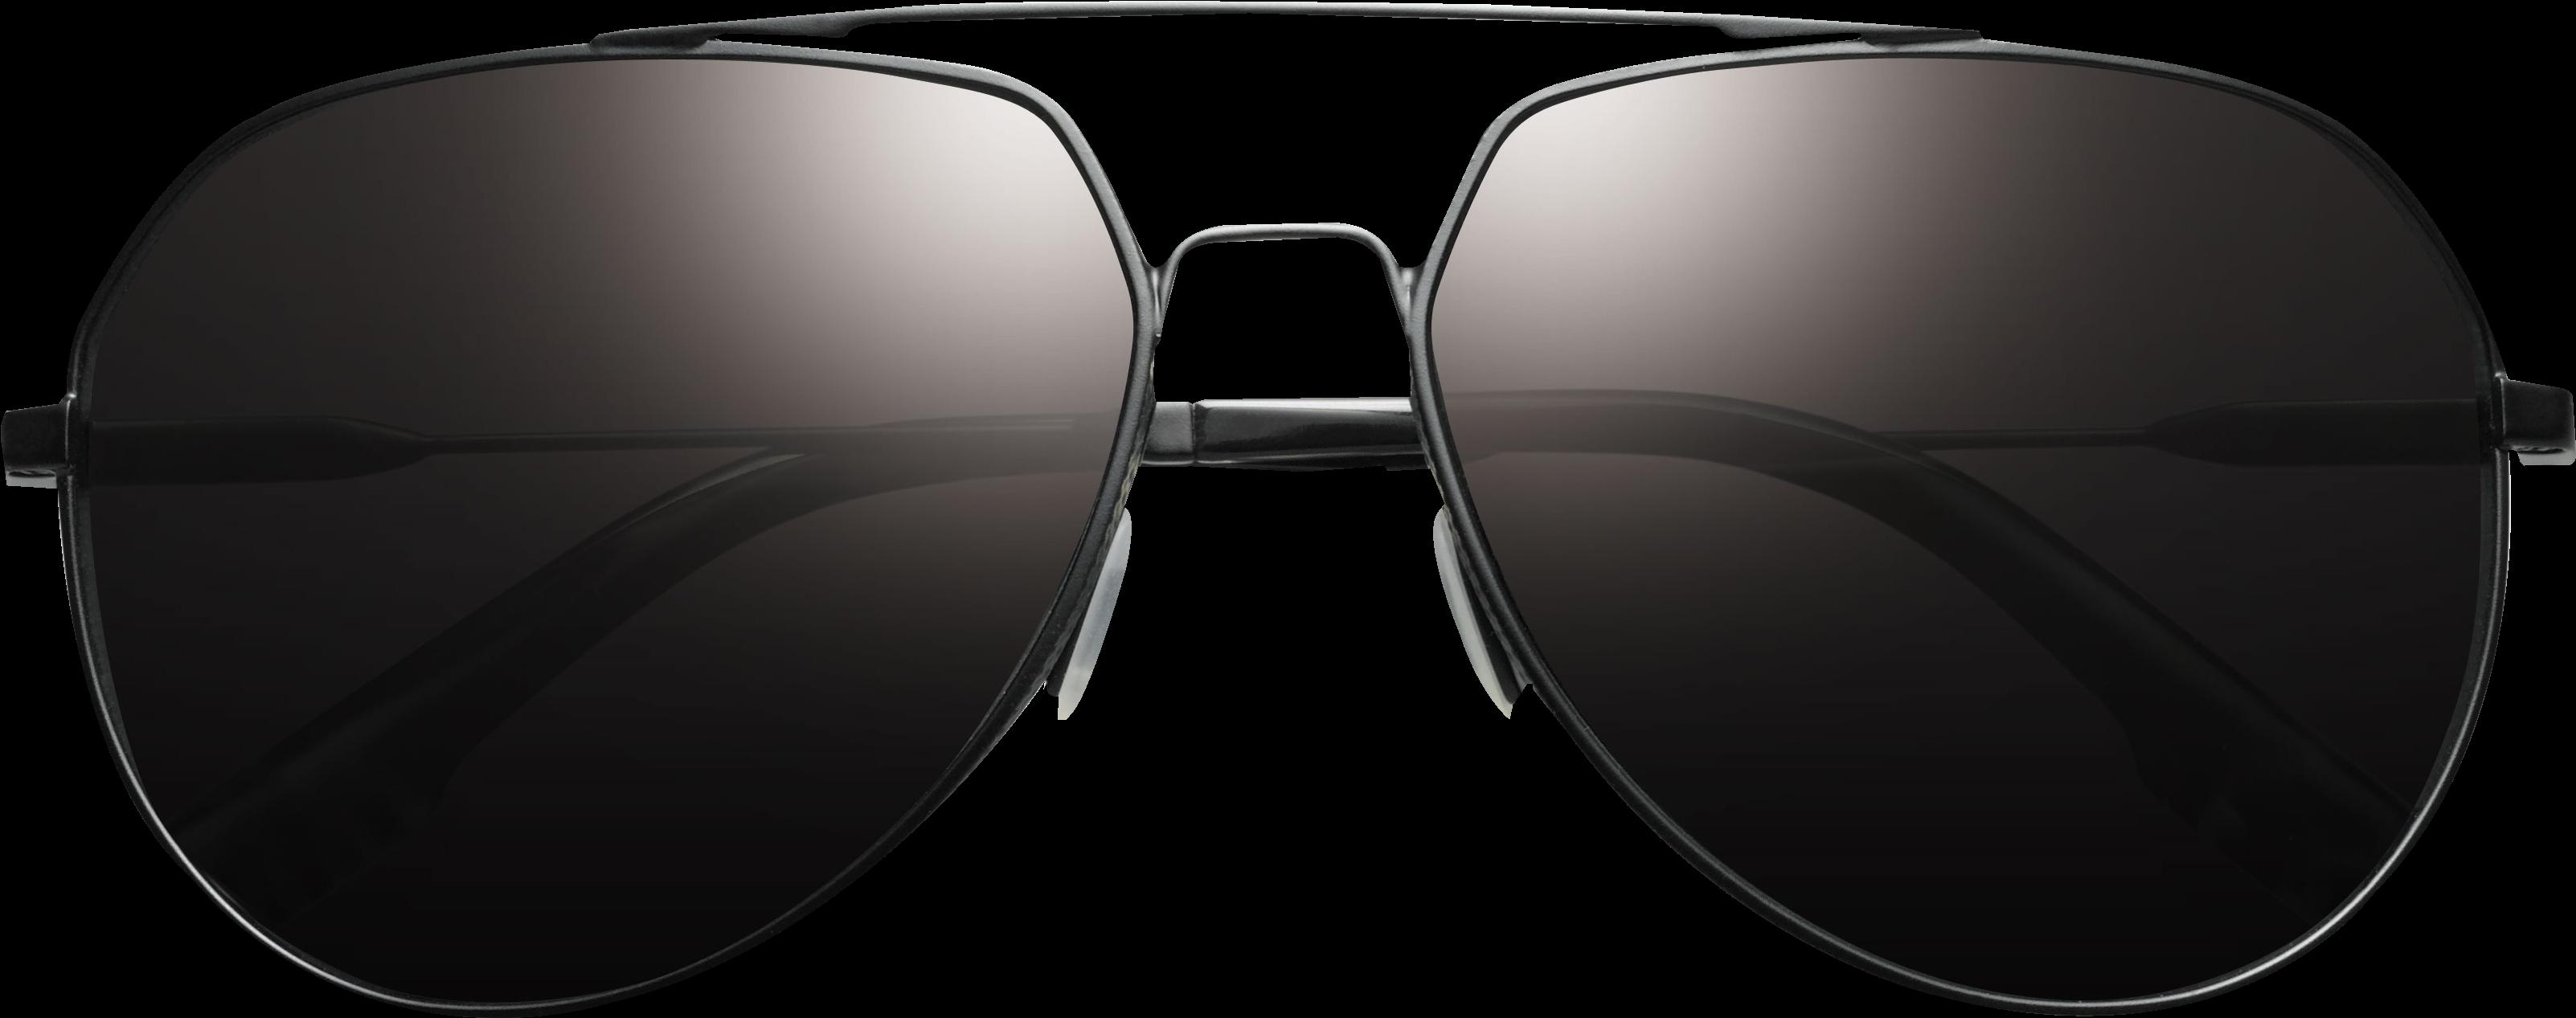 Free sunglasses silhouette clip. Eyeglasses clipart shades